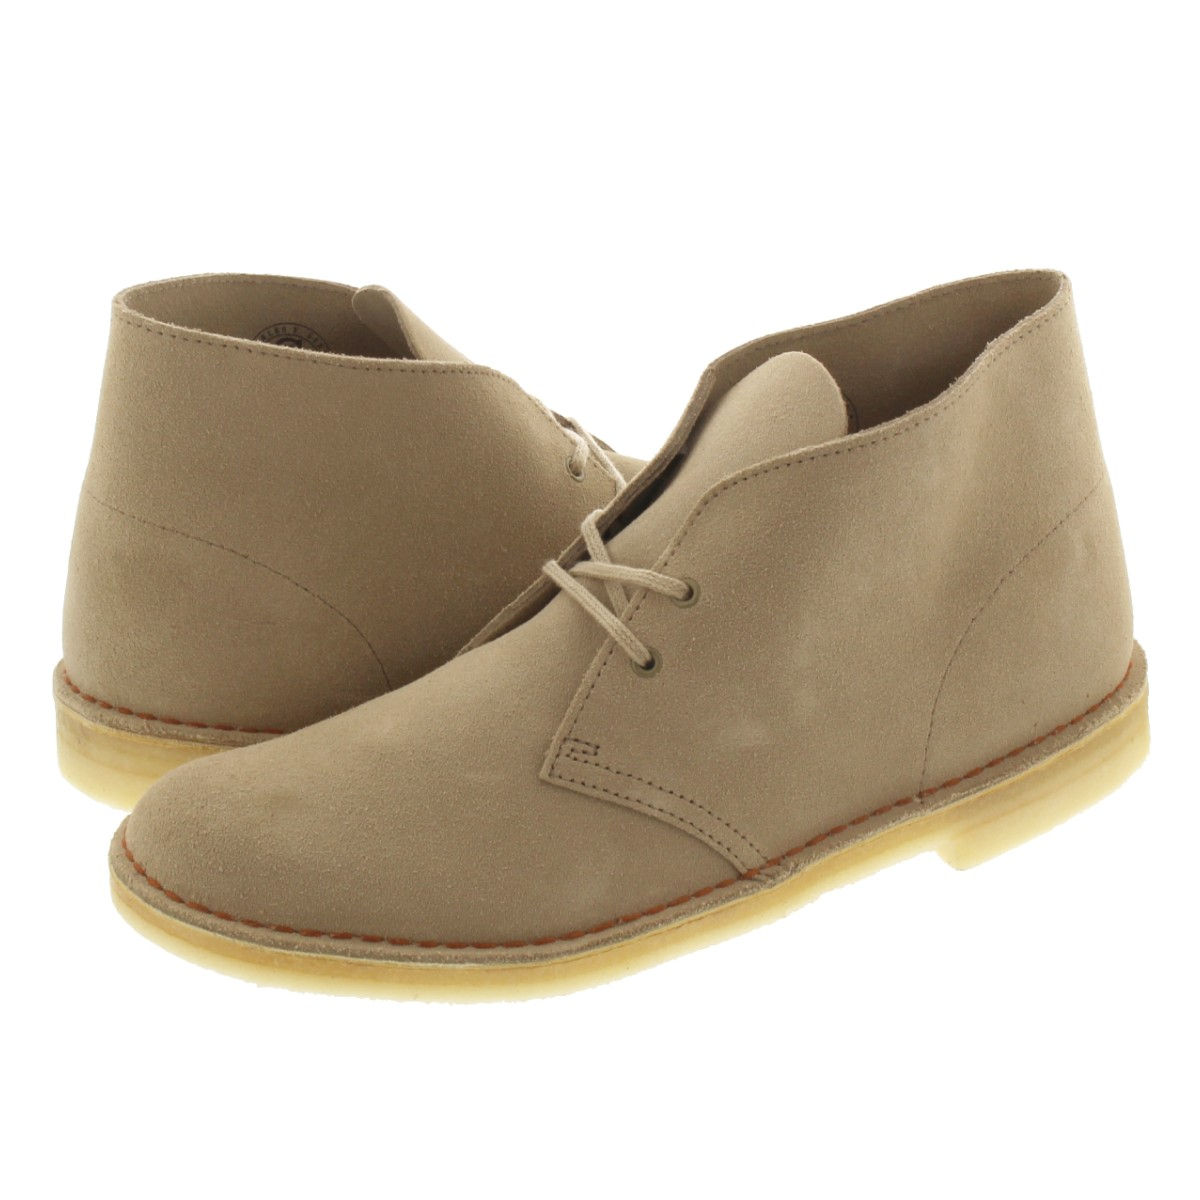 6ae6c3a1447 CLARKS DESERT BOOT kulaki desert boots SAND SUEDE 26138235